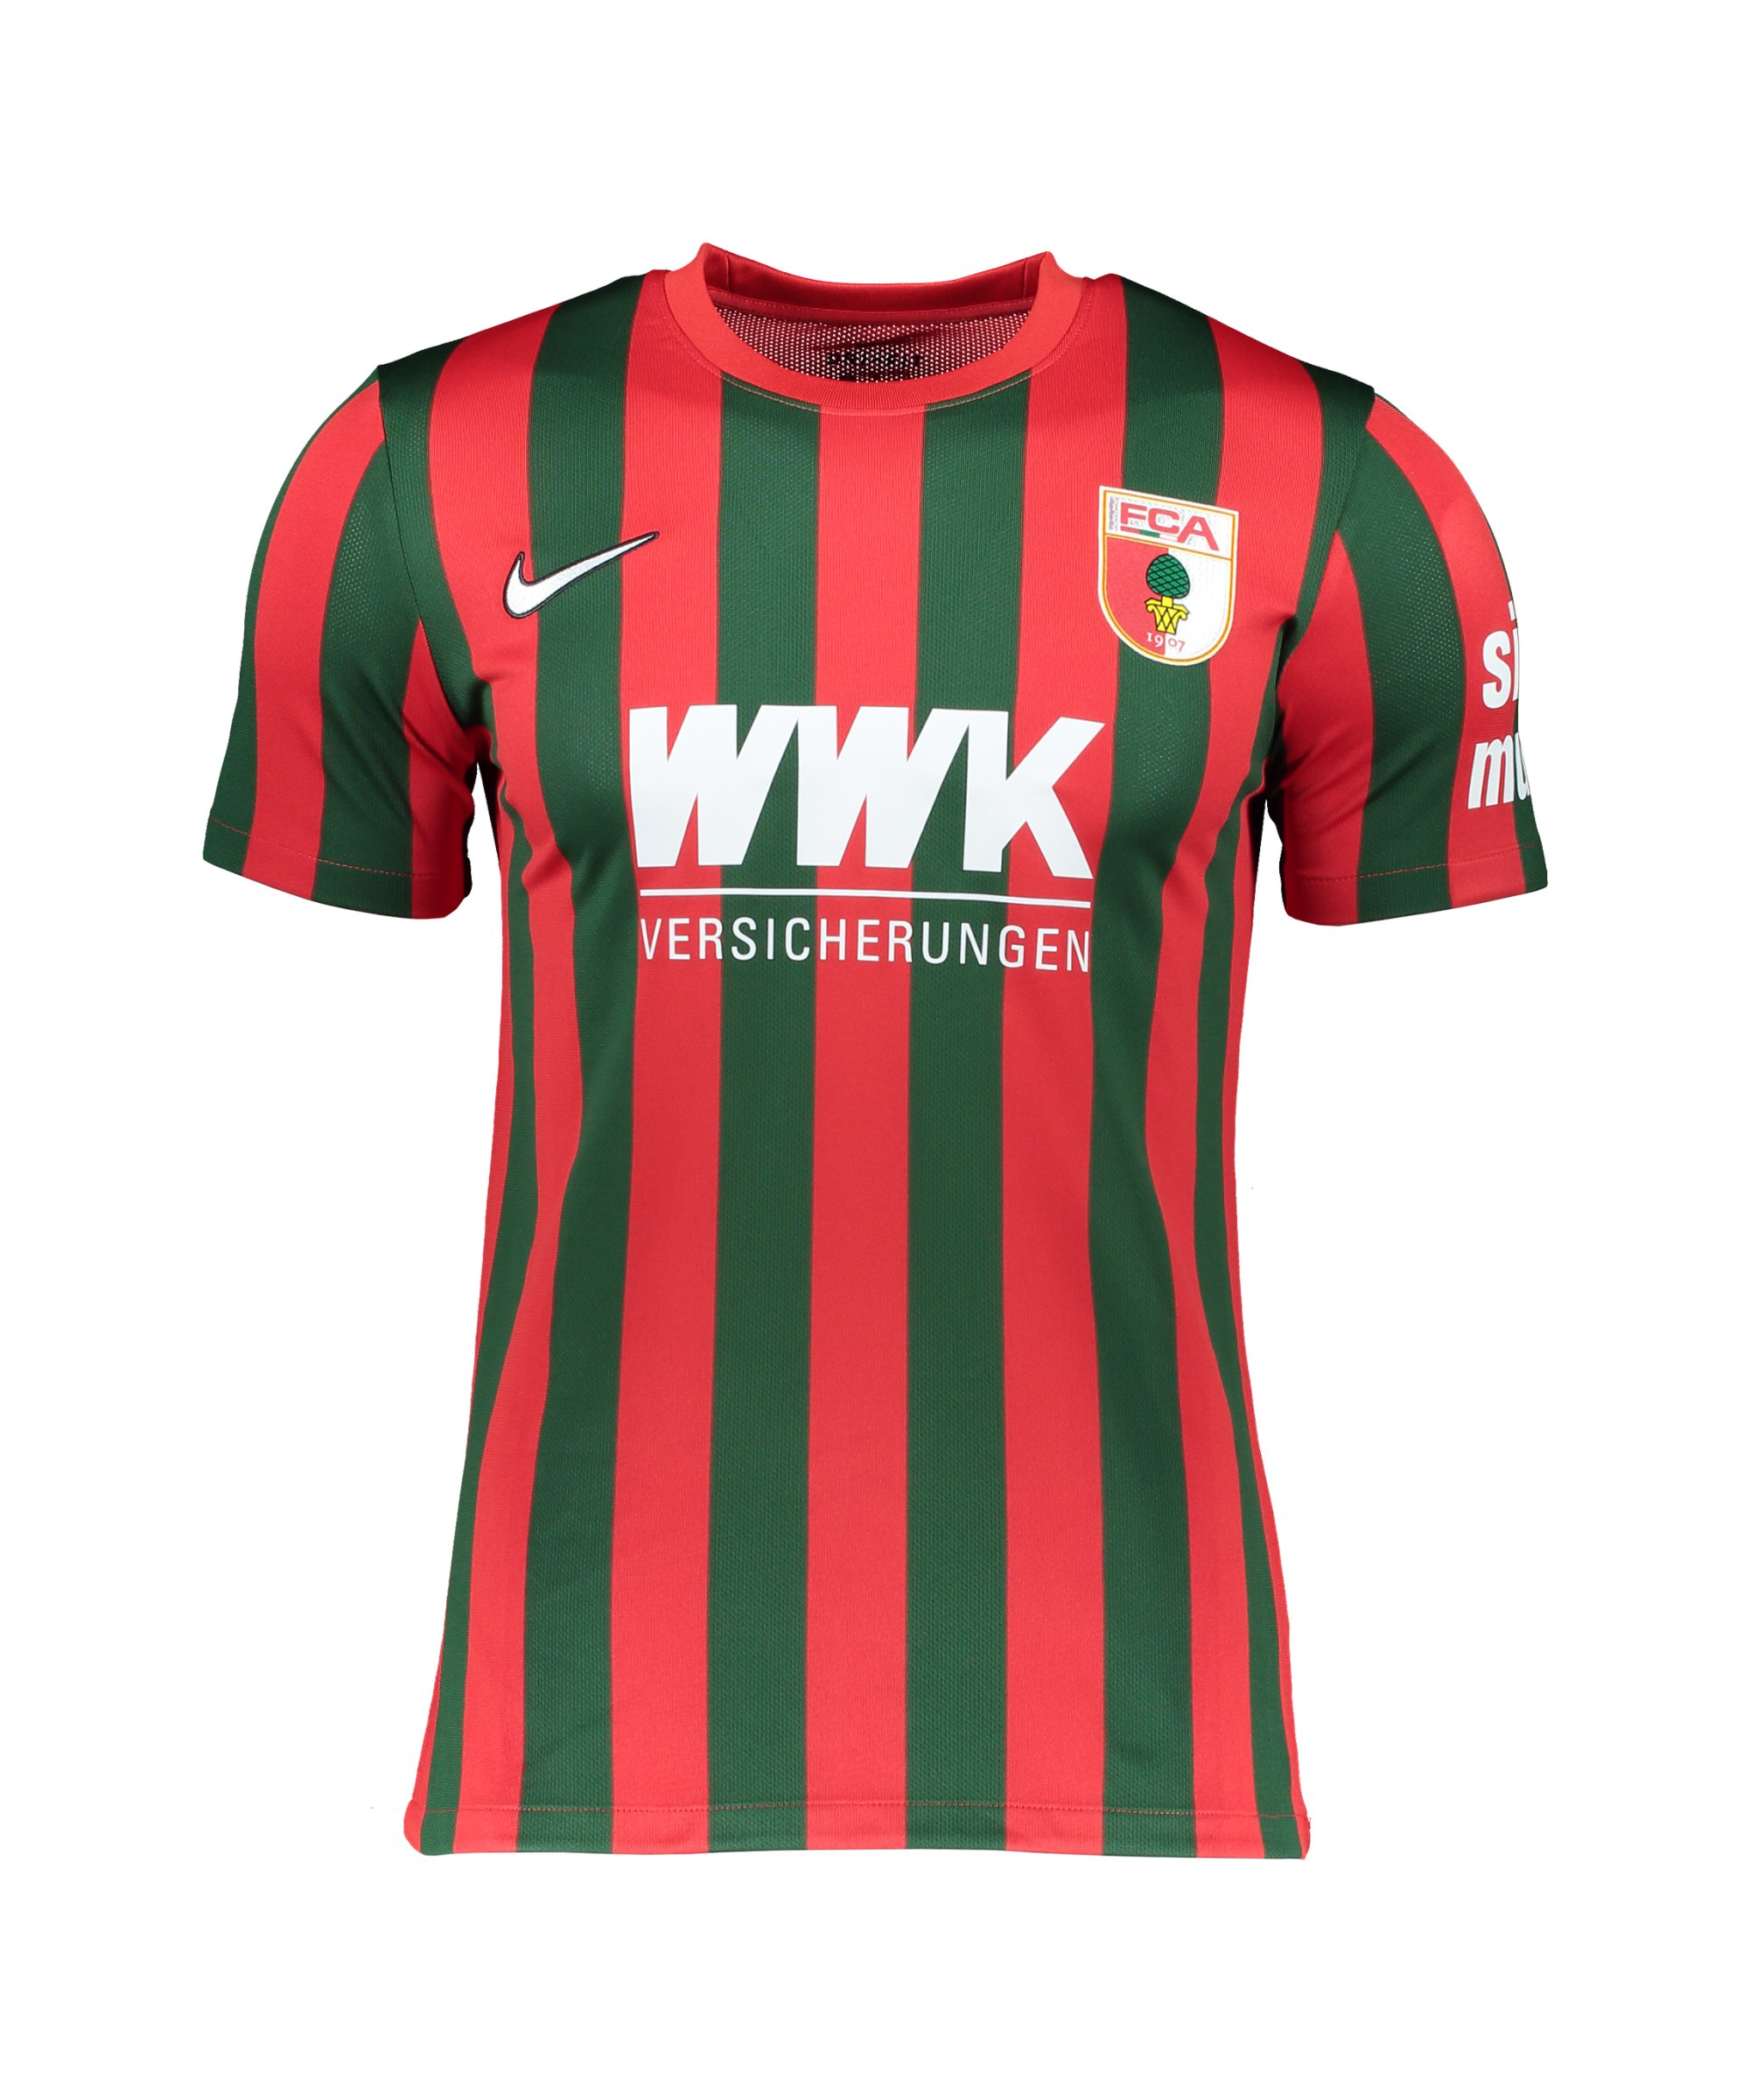 Nike FC Augsburg Trikot Home 2021/2022 Damen Rot Grün F659 - rot